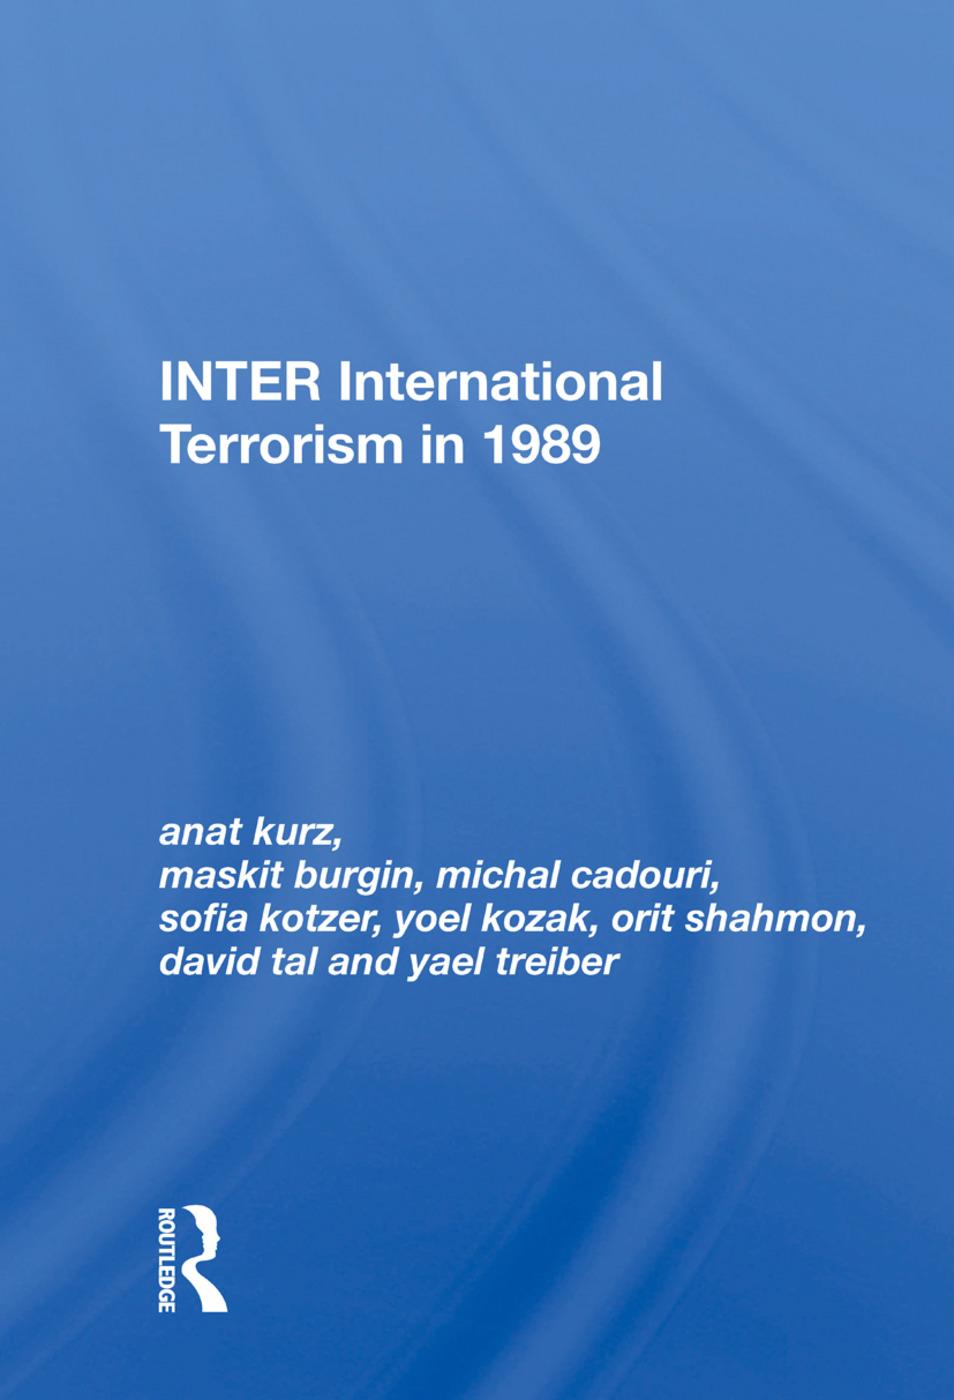 Inter International Terrorism in 1989